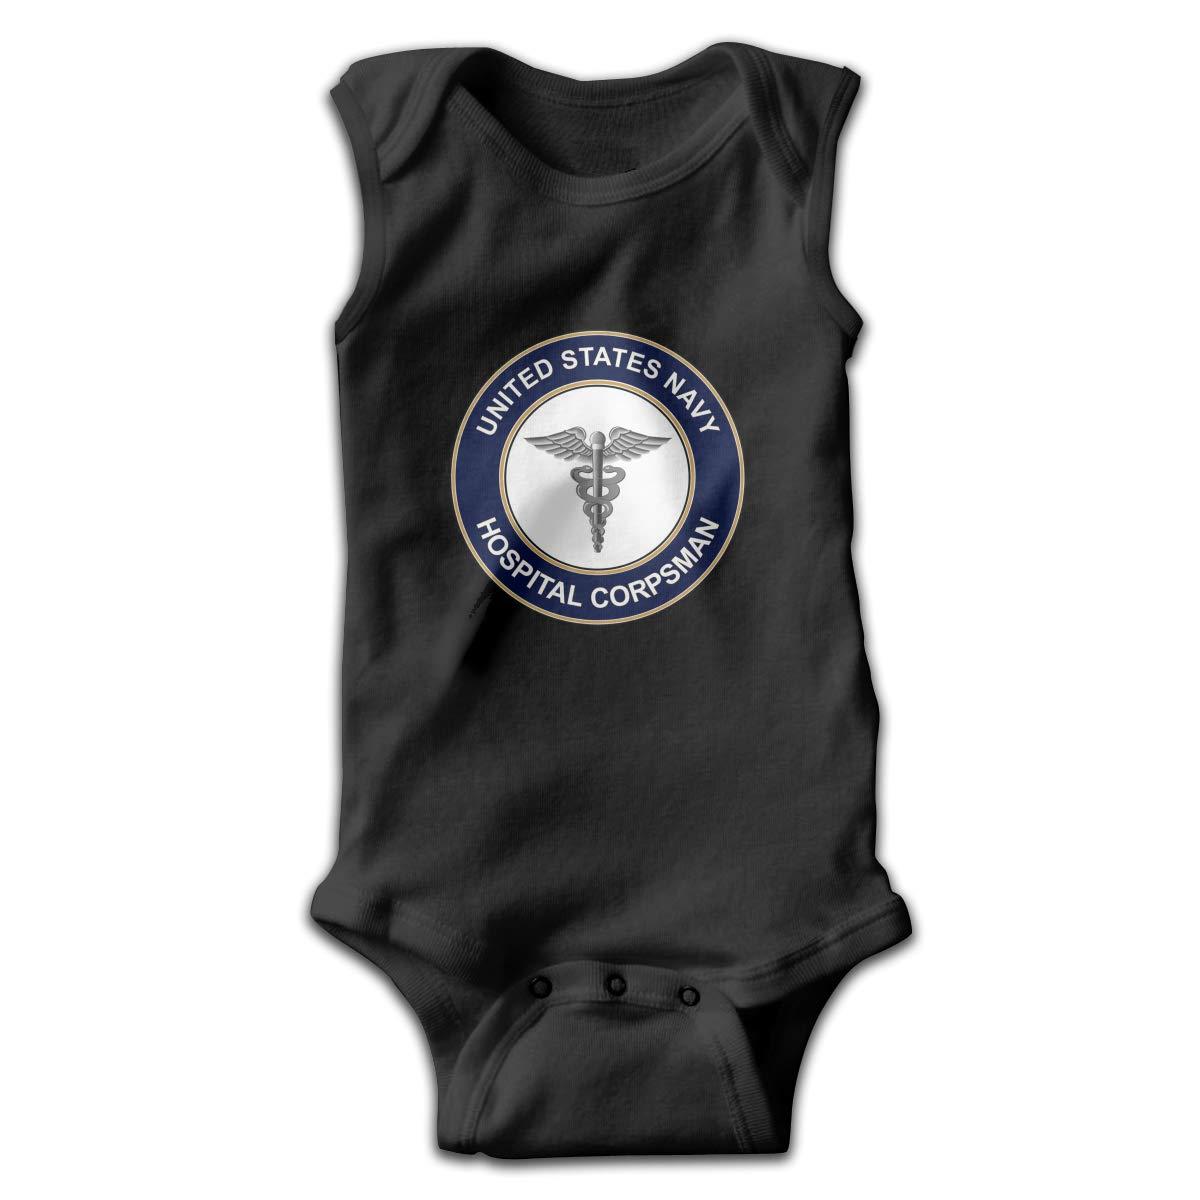 Dunpaiaa US Navy Hospital Corpsman Logo Smalls Baby Onesie,Infant Bodysuit Black